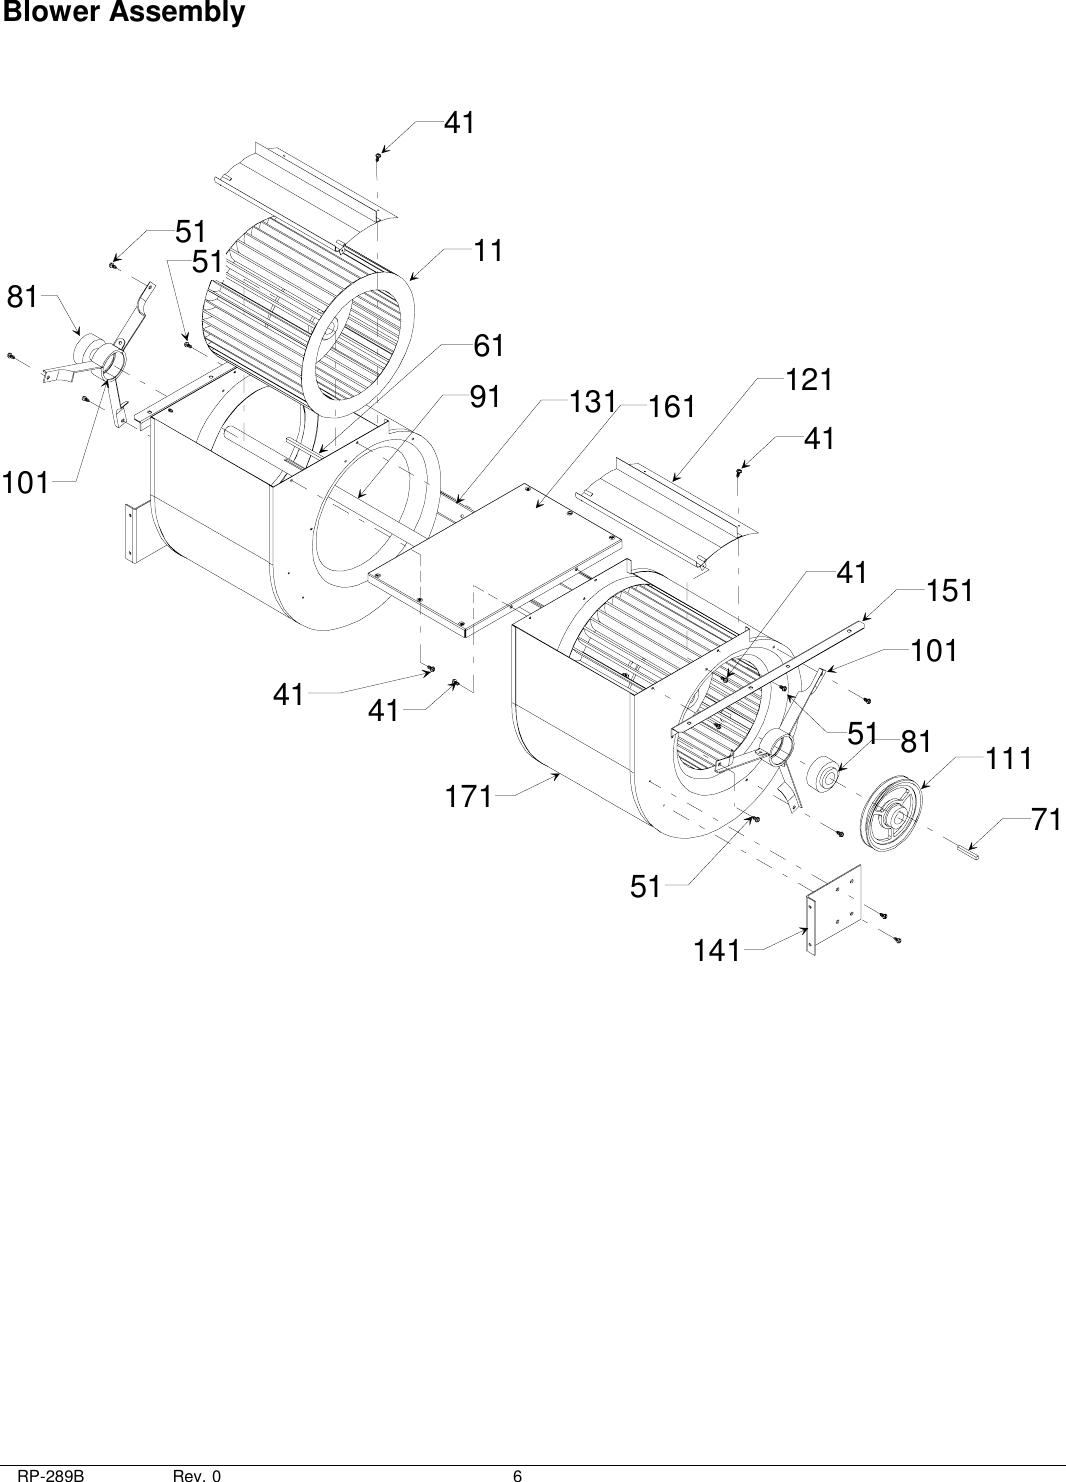 Goodman Mfg Co Lp Wheelchair Ar090 Users Manual RPT Parts